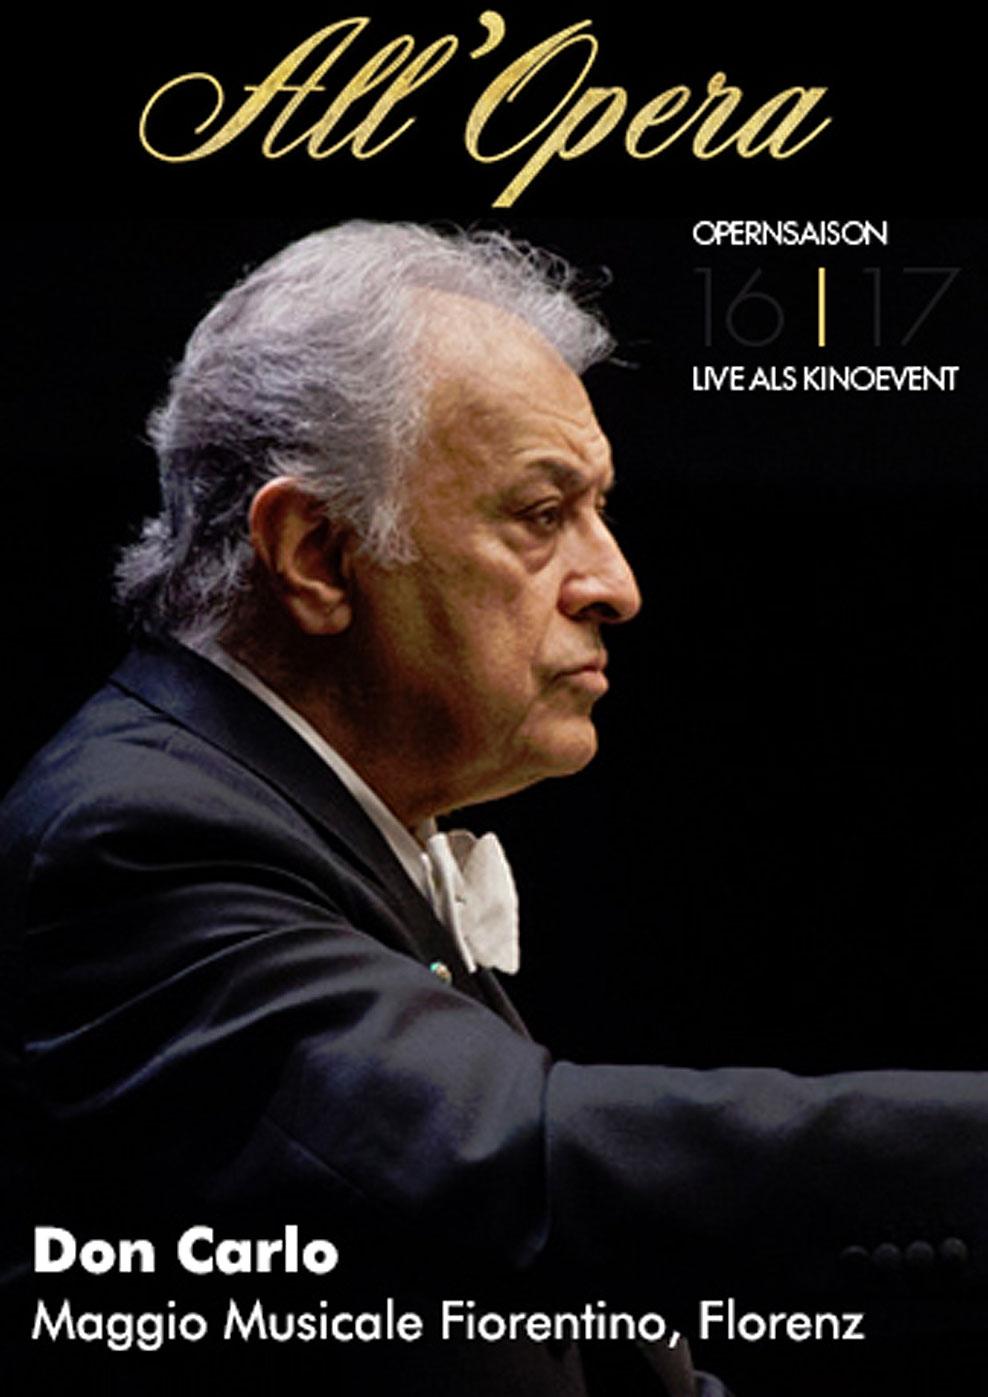 All Opera 16/17: Don Carlo (Live) (Poster)